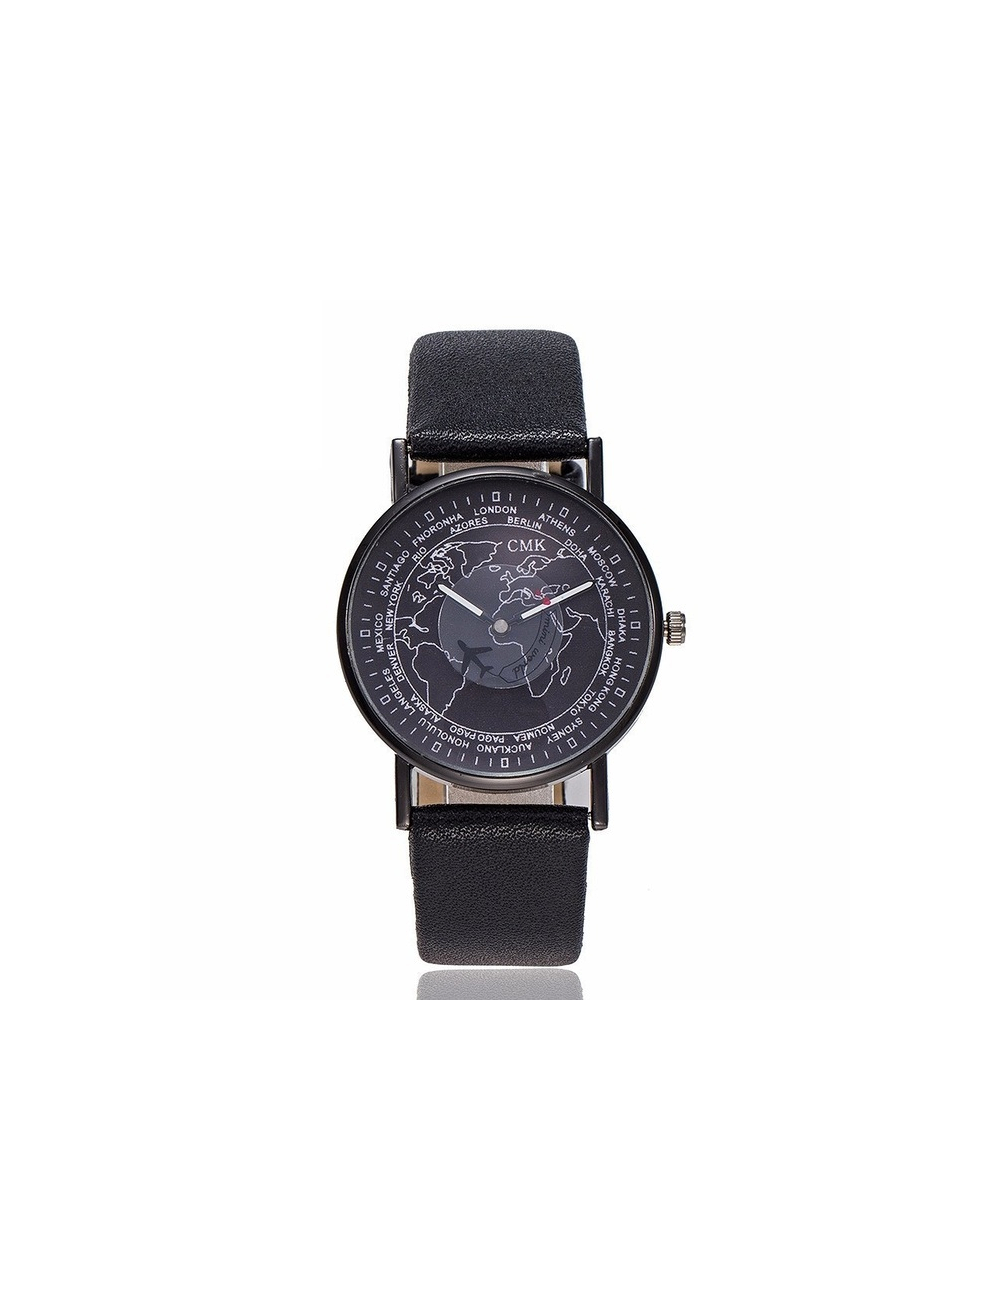 Reloj Mapamundi Dayoshop 33,900.00